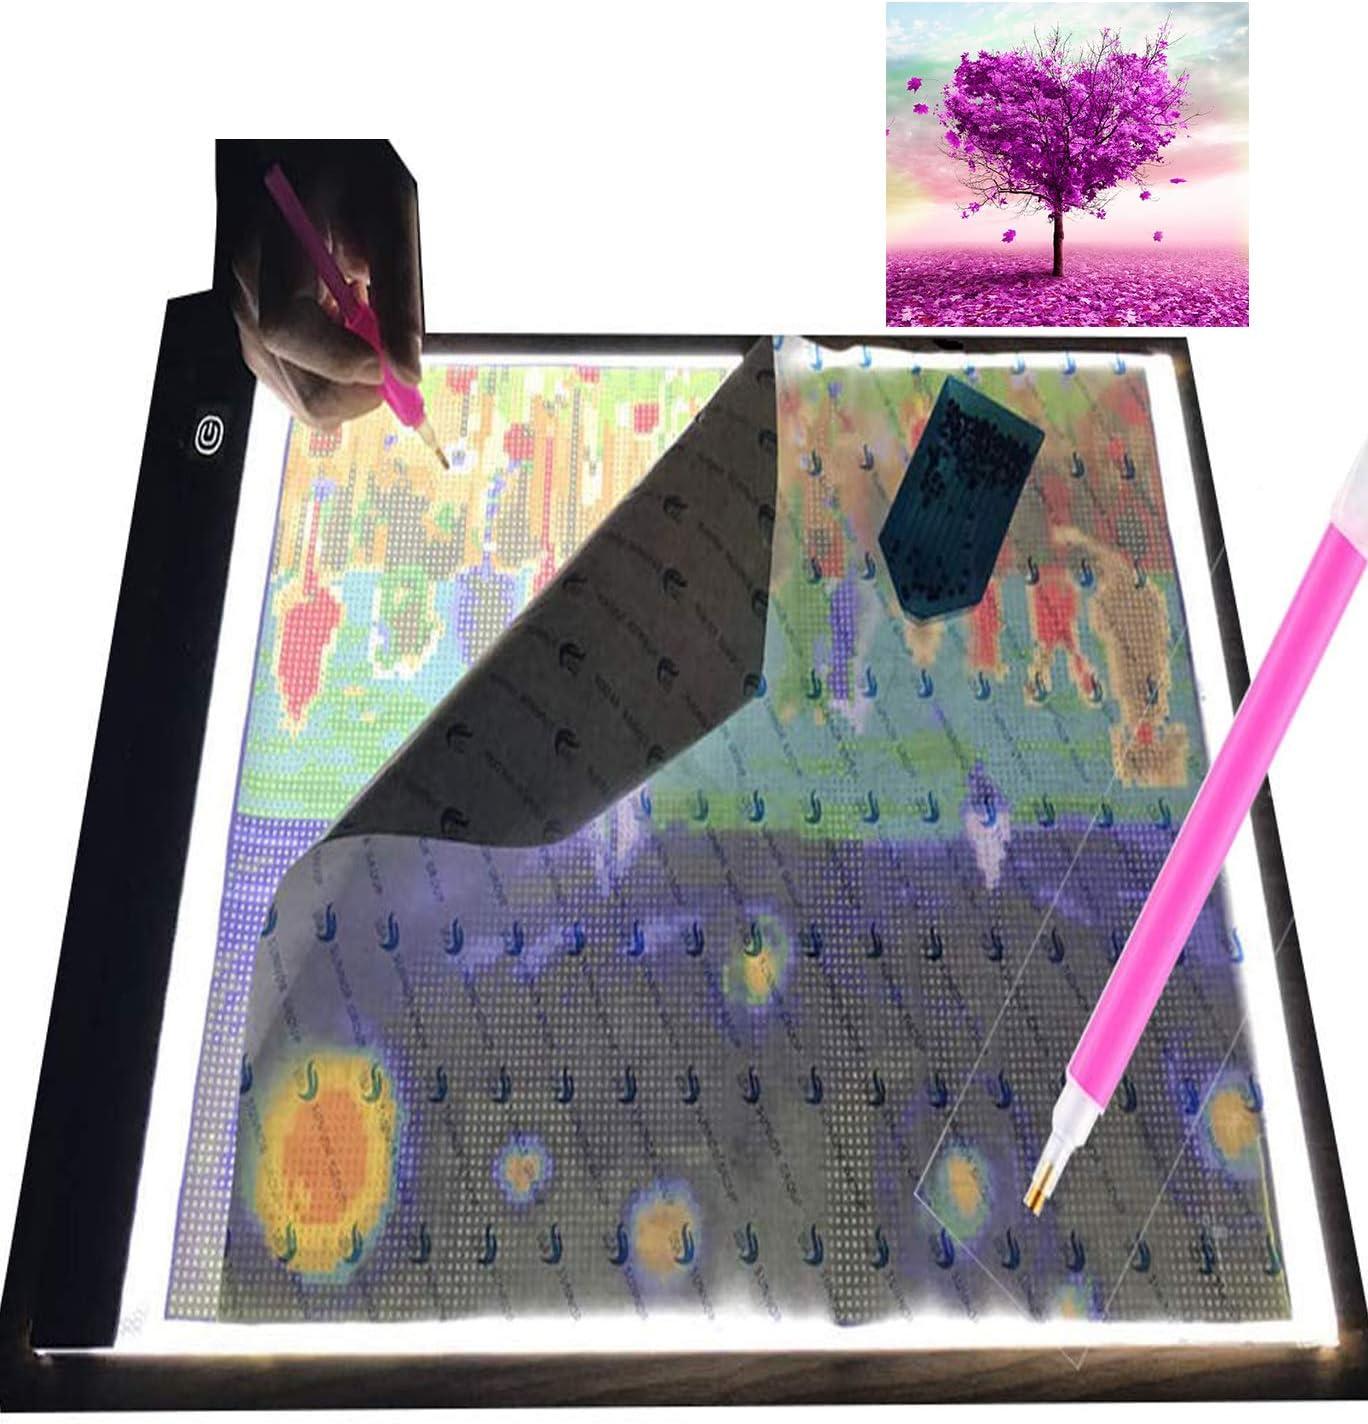 Love Tree Diamond Painting Kits DIY 5D Diamond Painting Full Drill with Ultra-Thin Portable A3 LED Light Pad Light Board Box Kits for Adults Kids